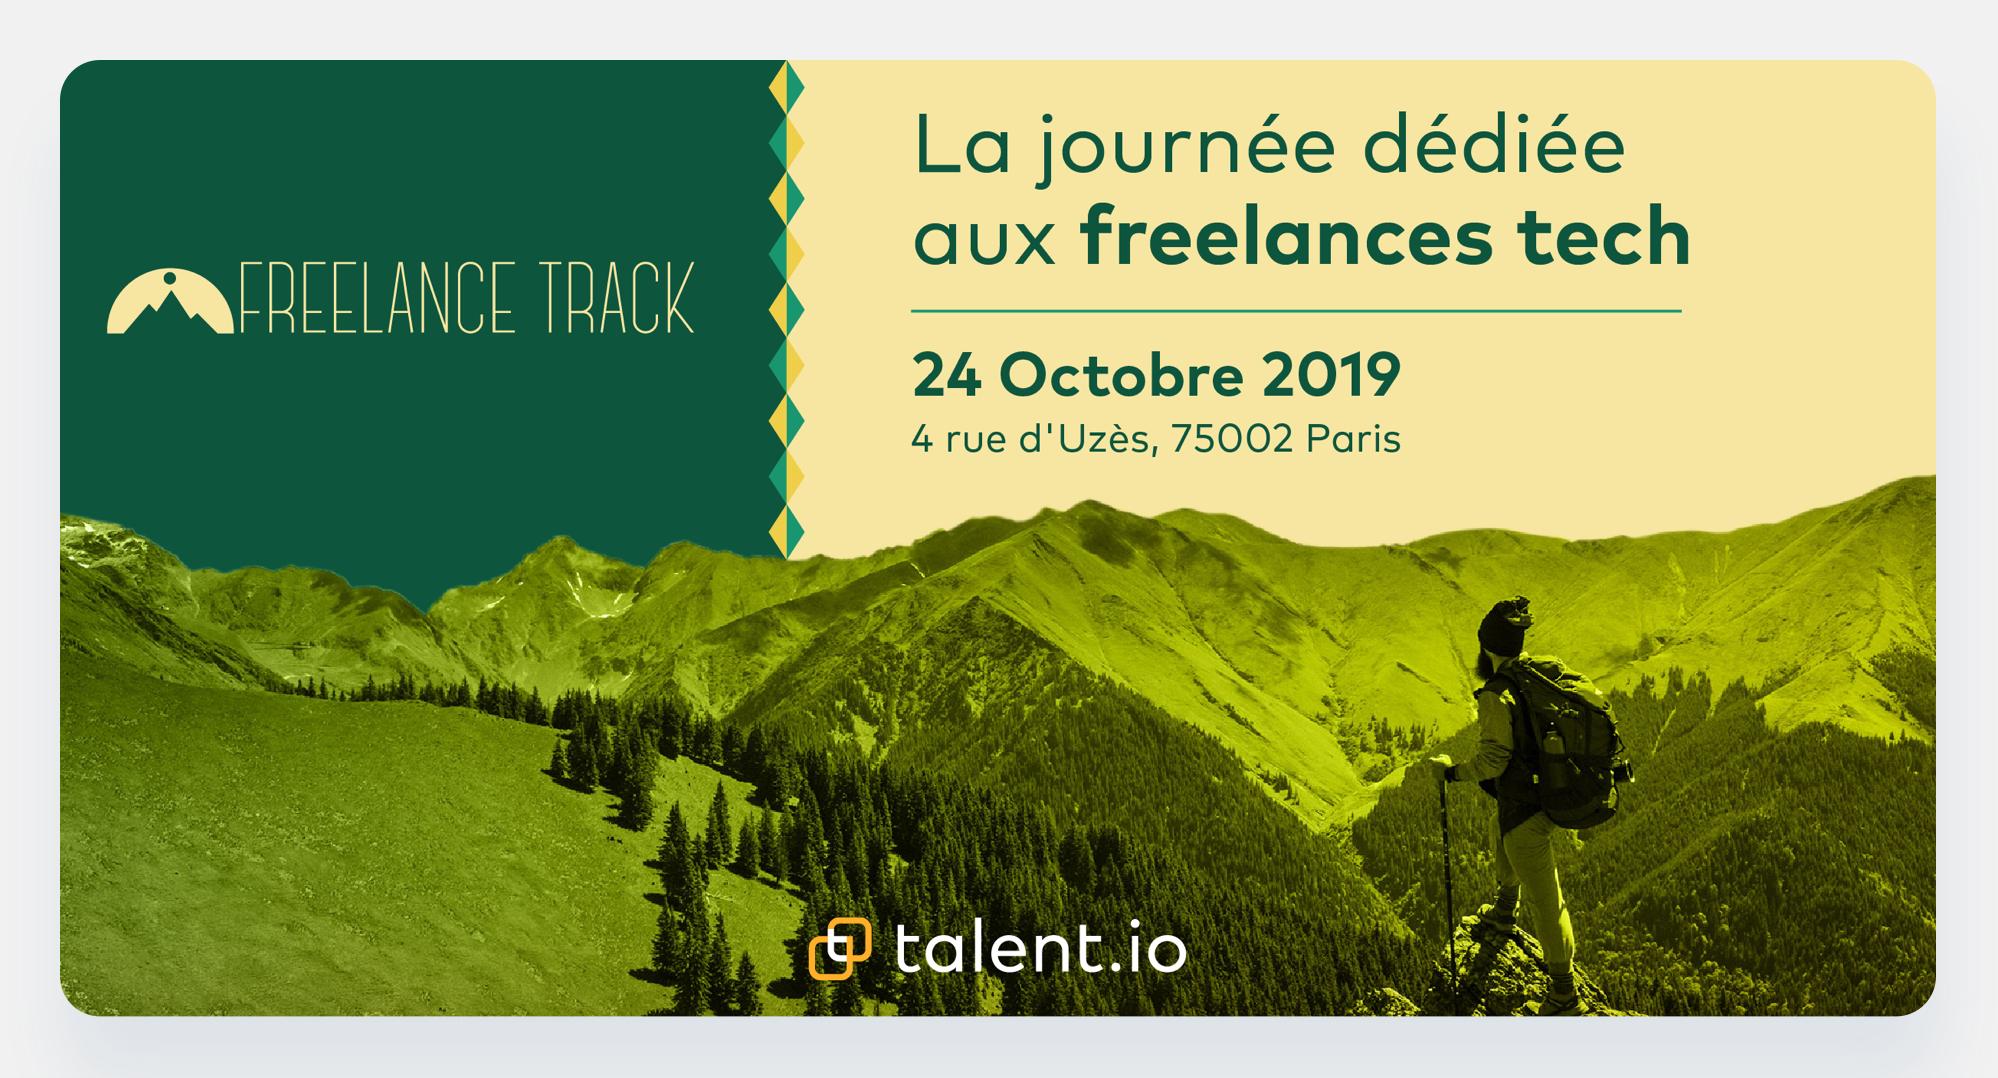 Freebe : Freebe t'invite au prochain Freelance Track!